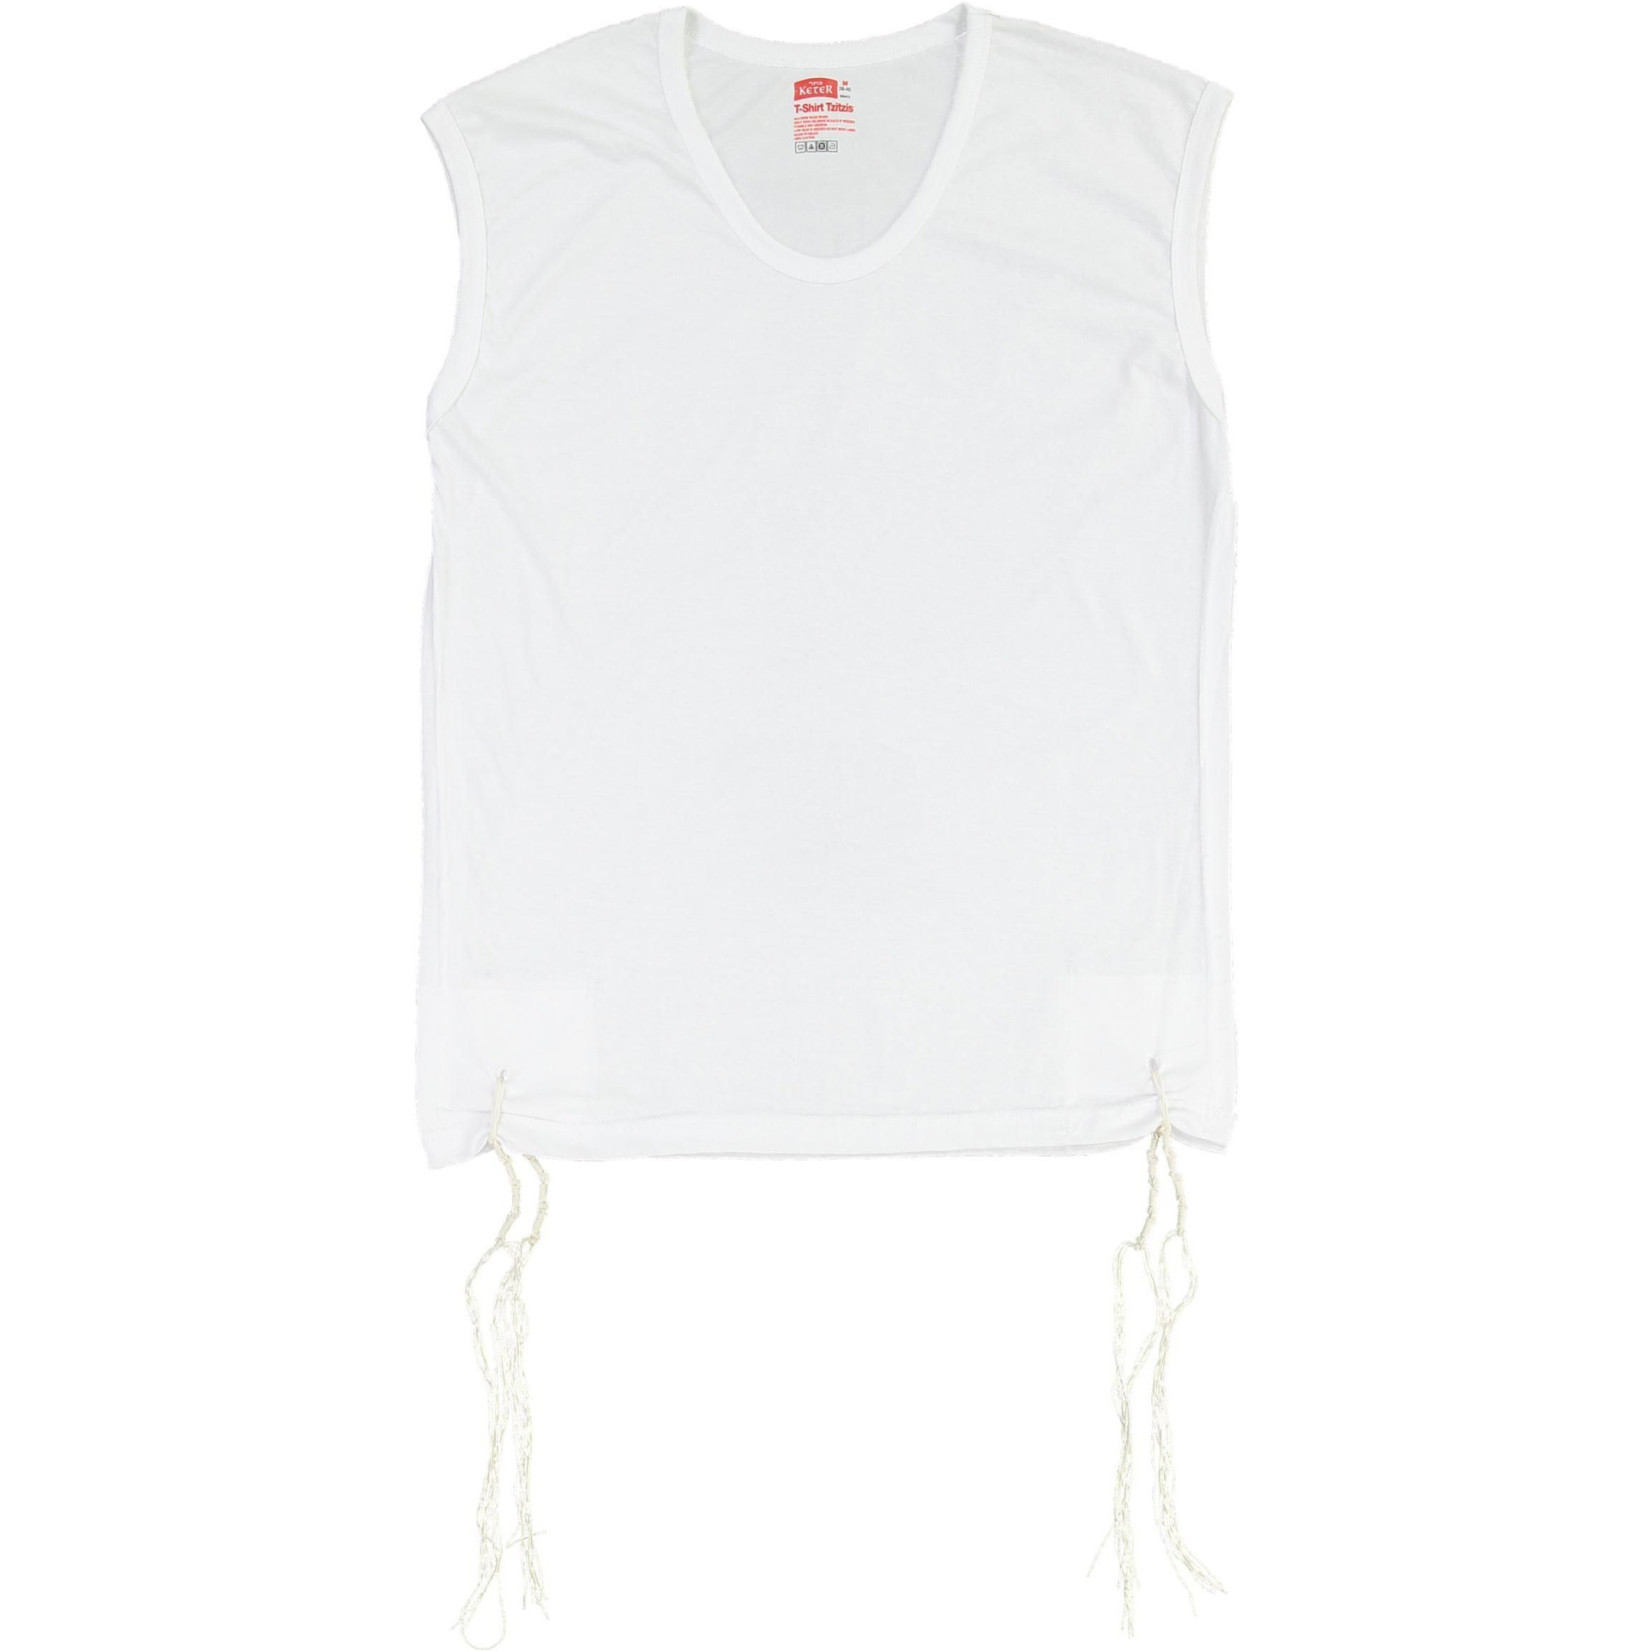 Undershirt-Style Arbah Kanfot, 100% Cotton, Round Neck, Size 5